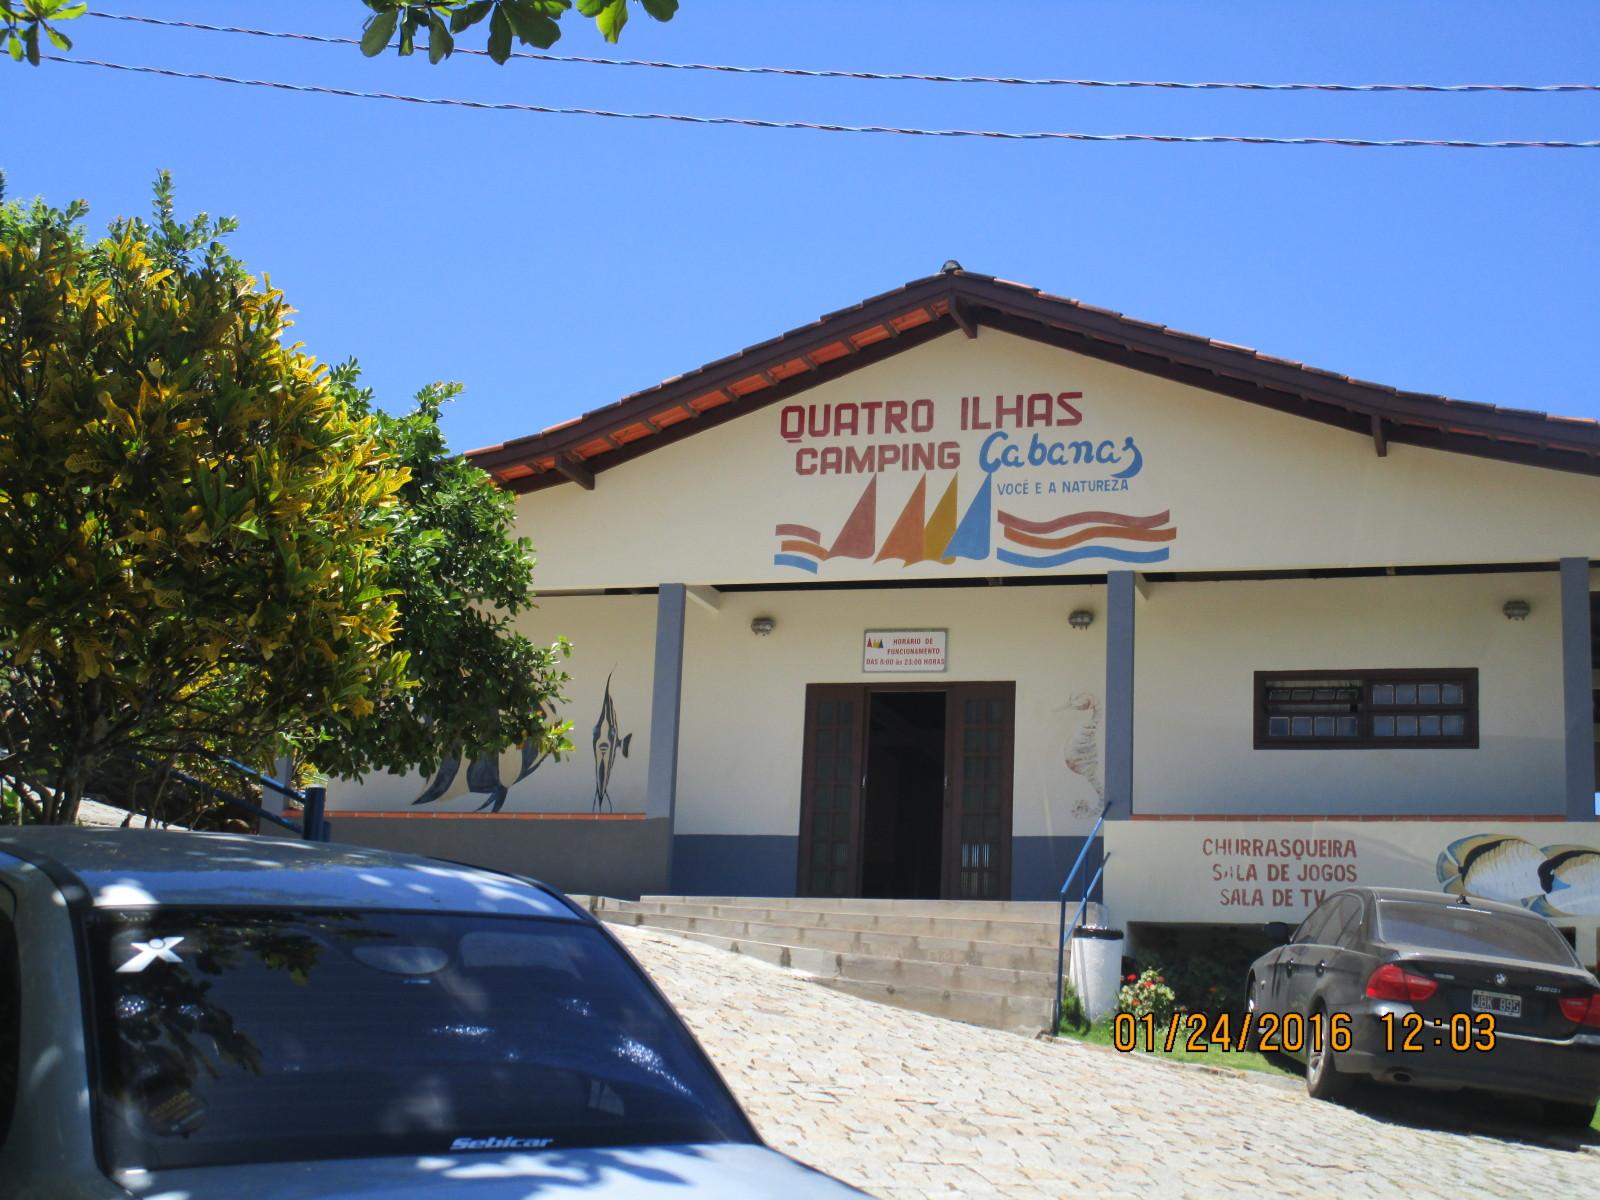 Informe Camping en Brasil - Camping 4 Ilhas - Bombas y Bombinhas 2ldycdl